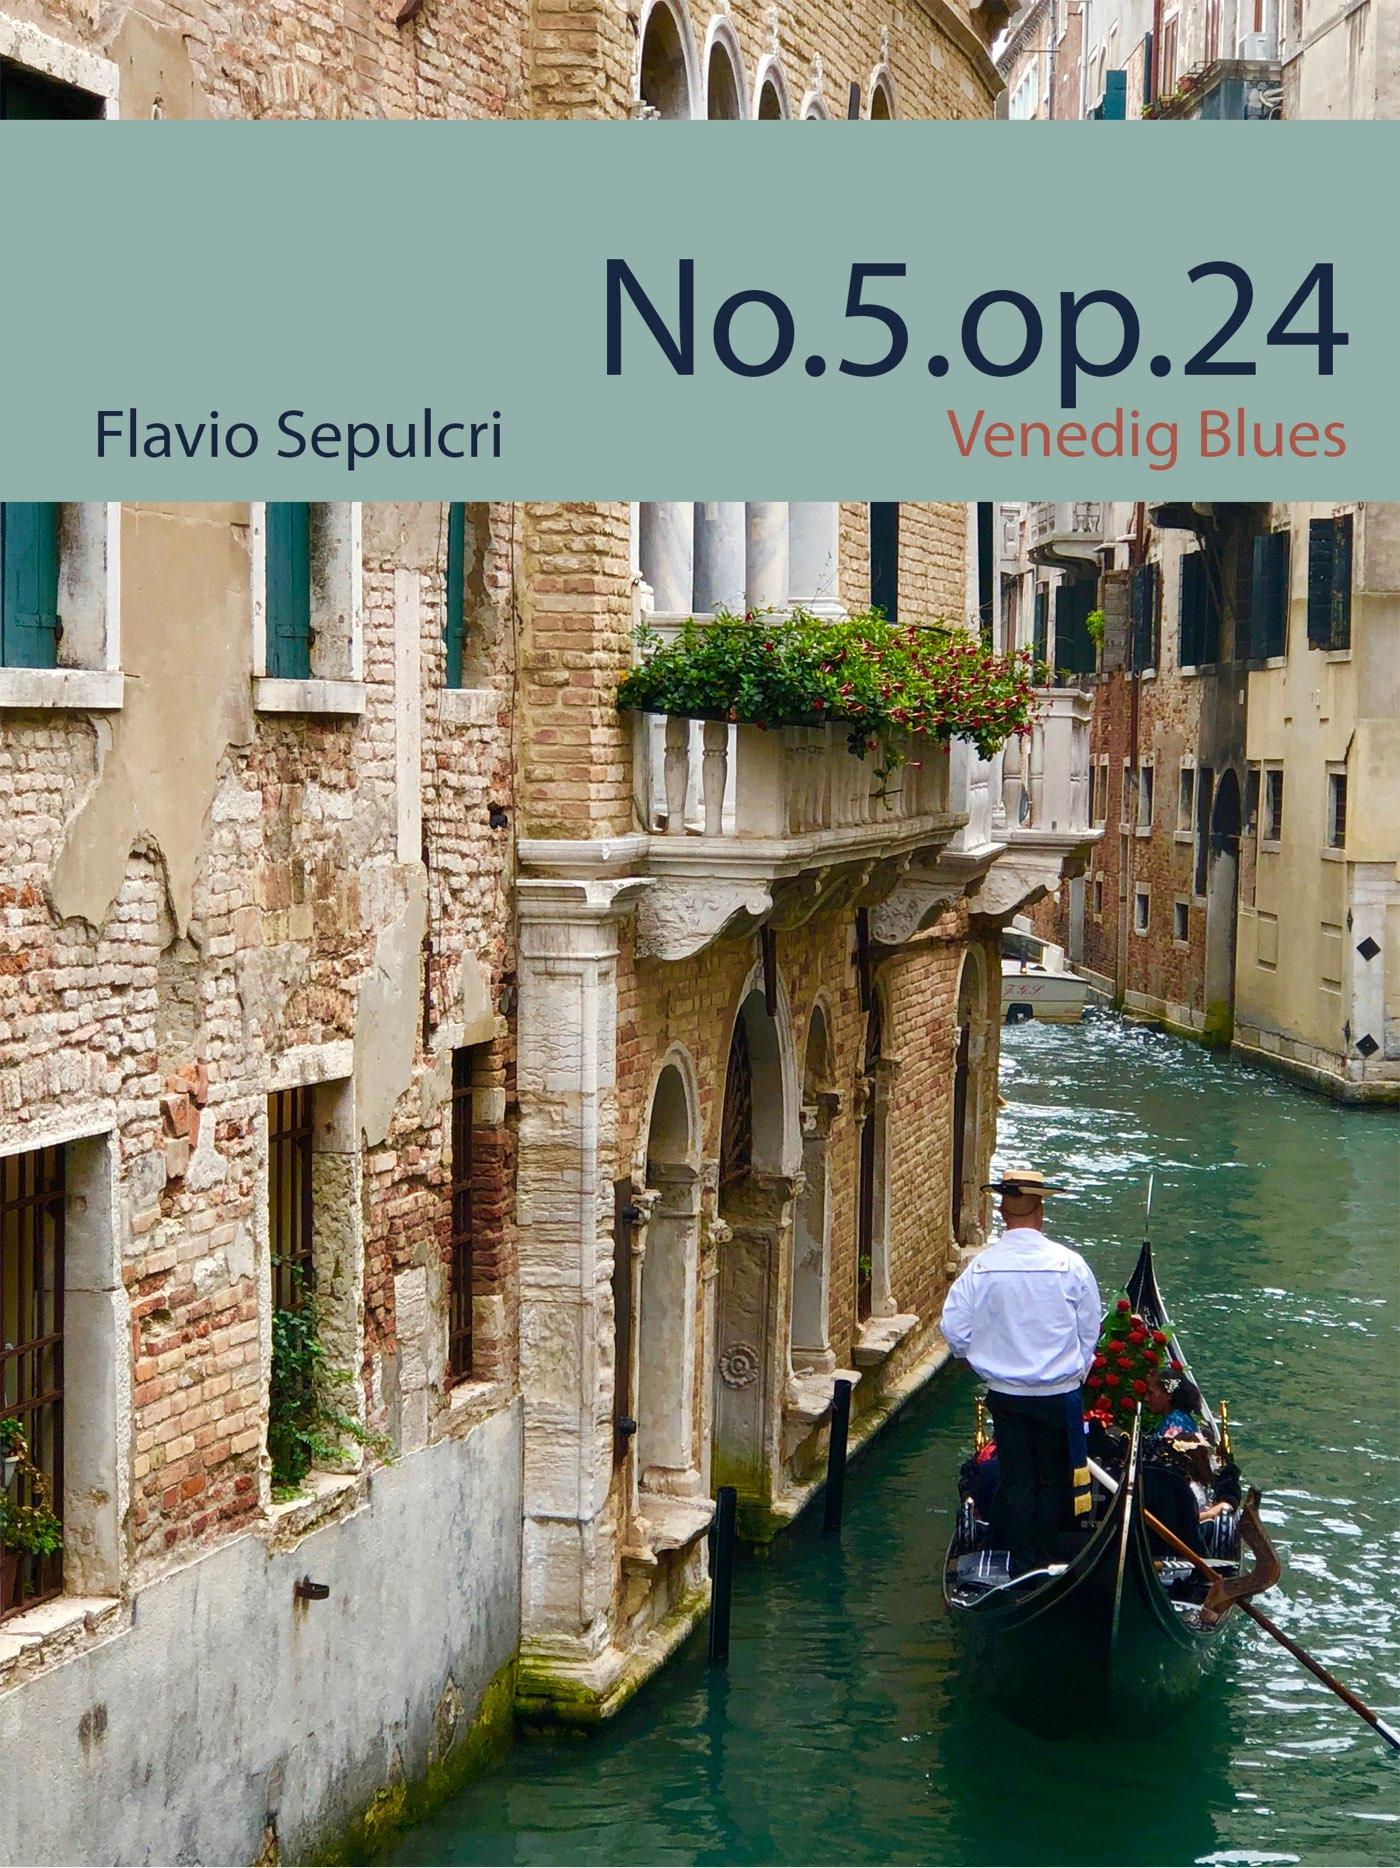 Flavio Sepulcri: No. 5. Op. 24